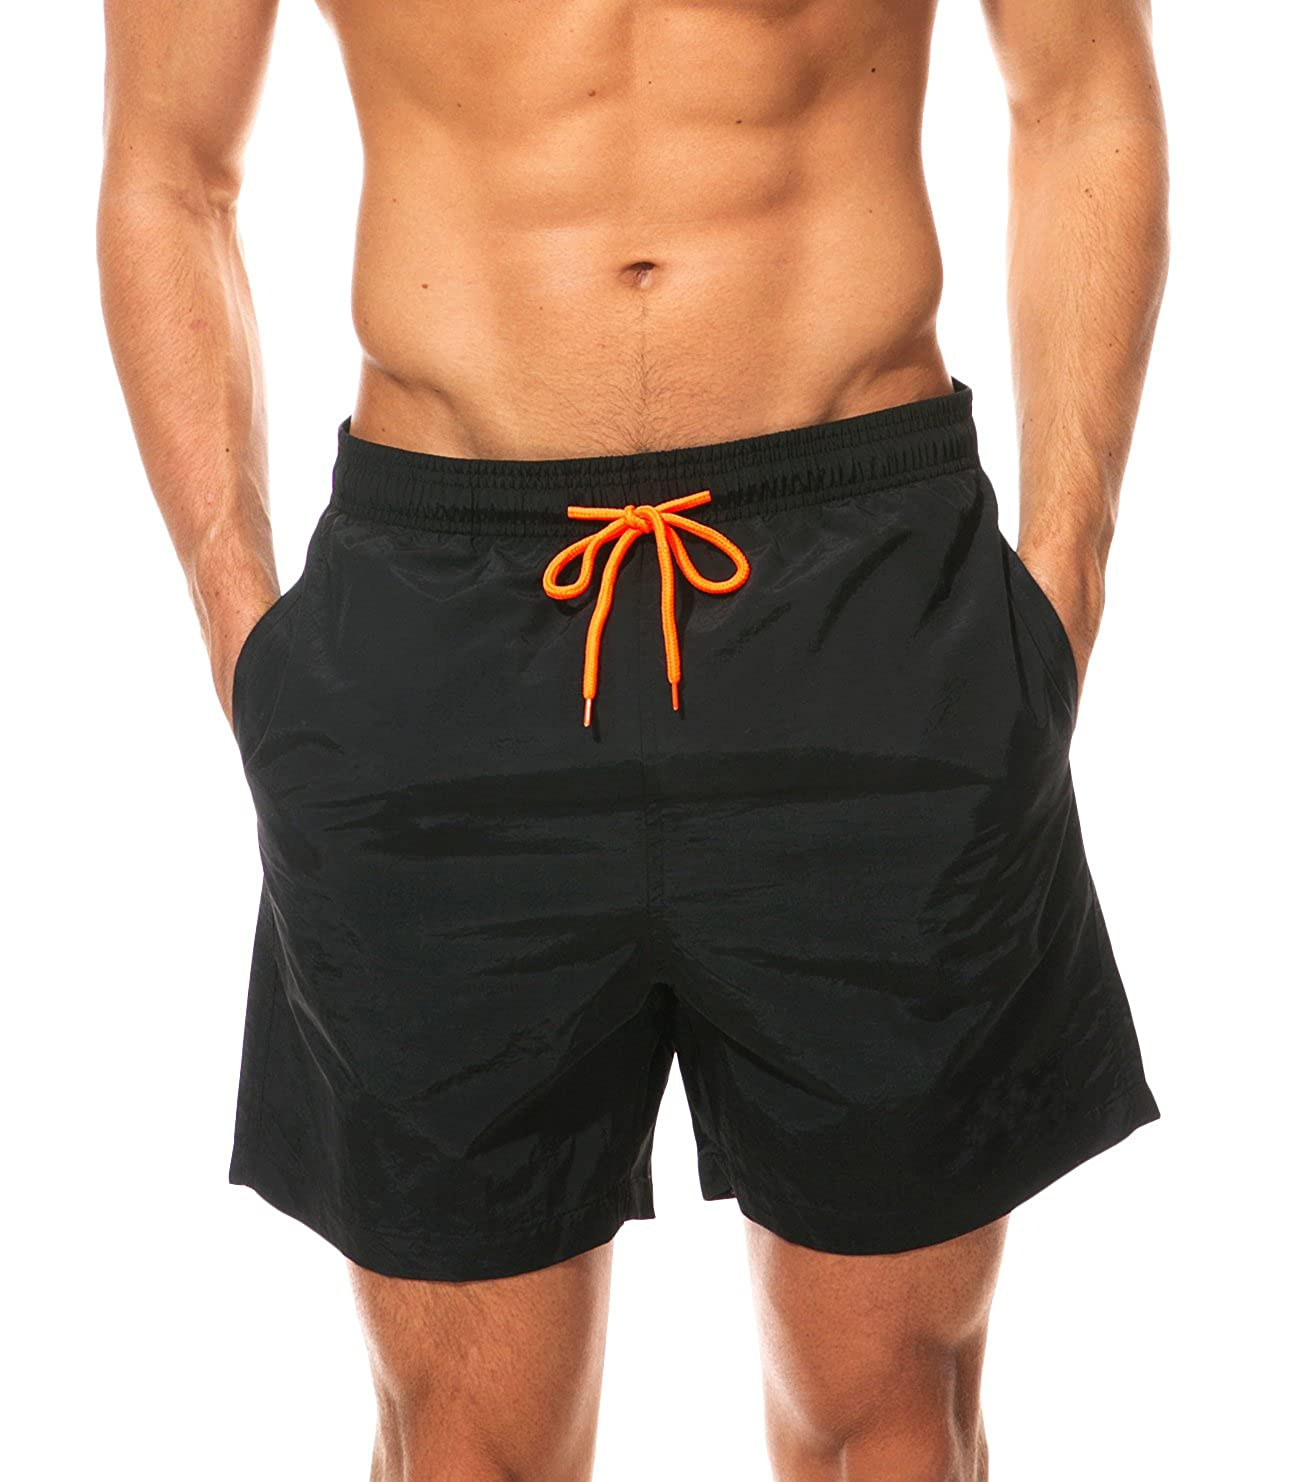 WUAMBO Men's Solid Board Shorts Fashion Swim Trunk VROL0092-1LET